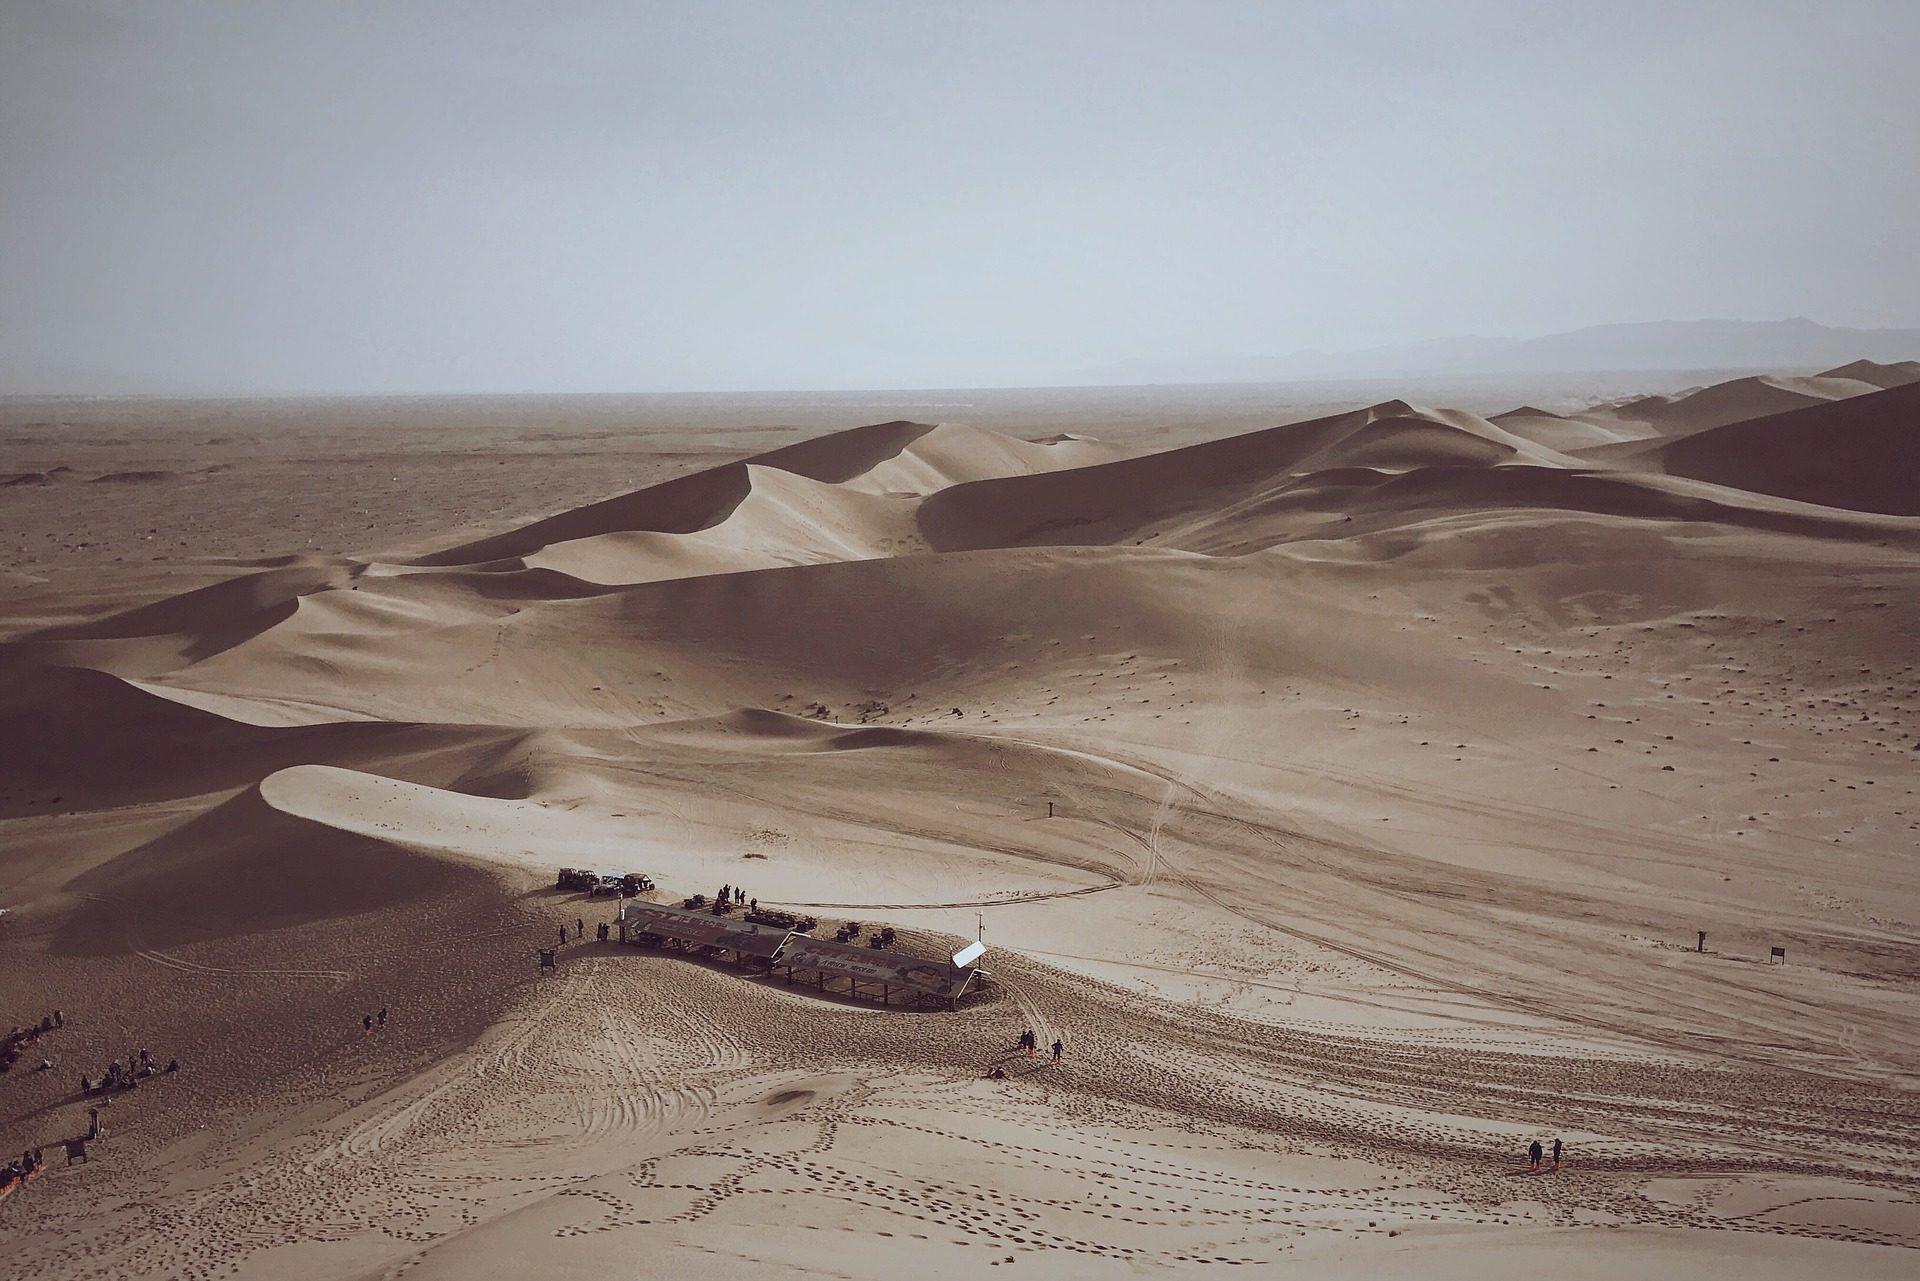 deserto, Dune, sabbia, orme, persone, Mingsha - Sfondi HD - Professor-falken.com